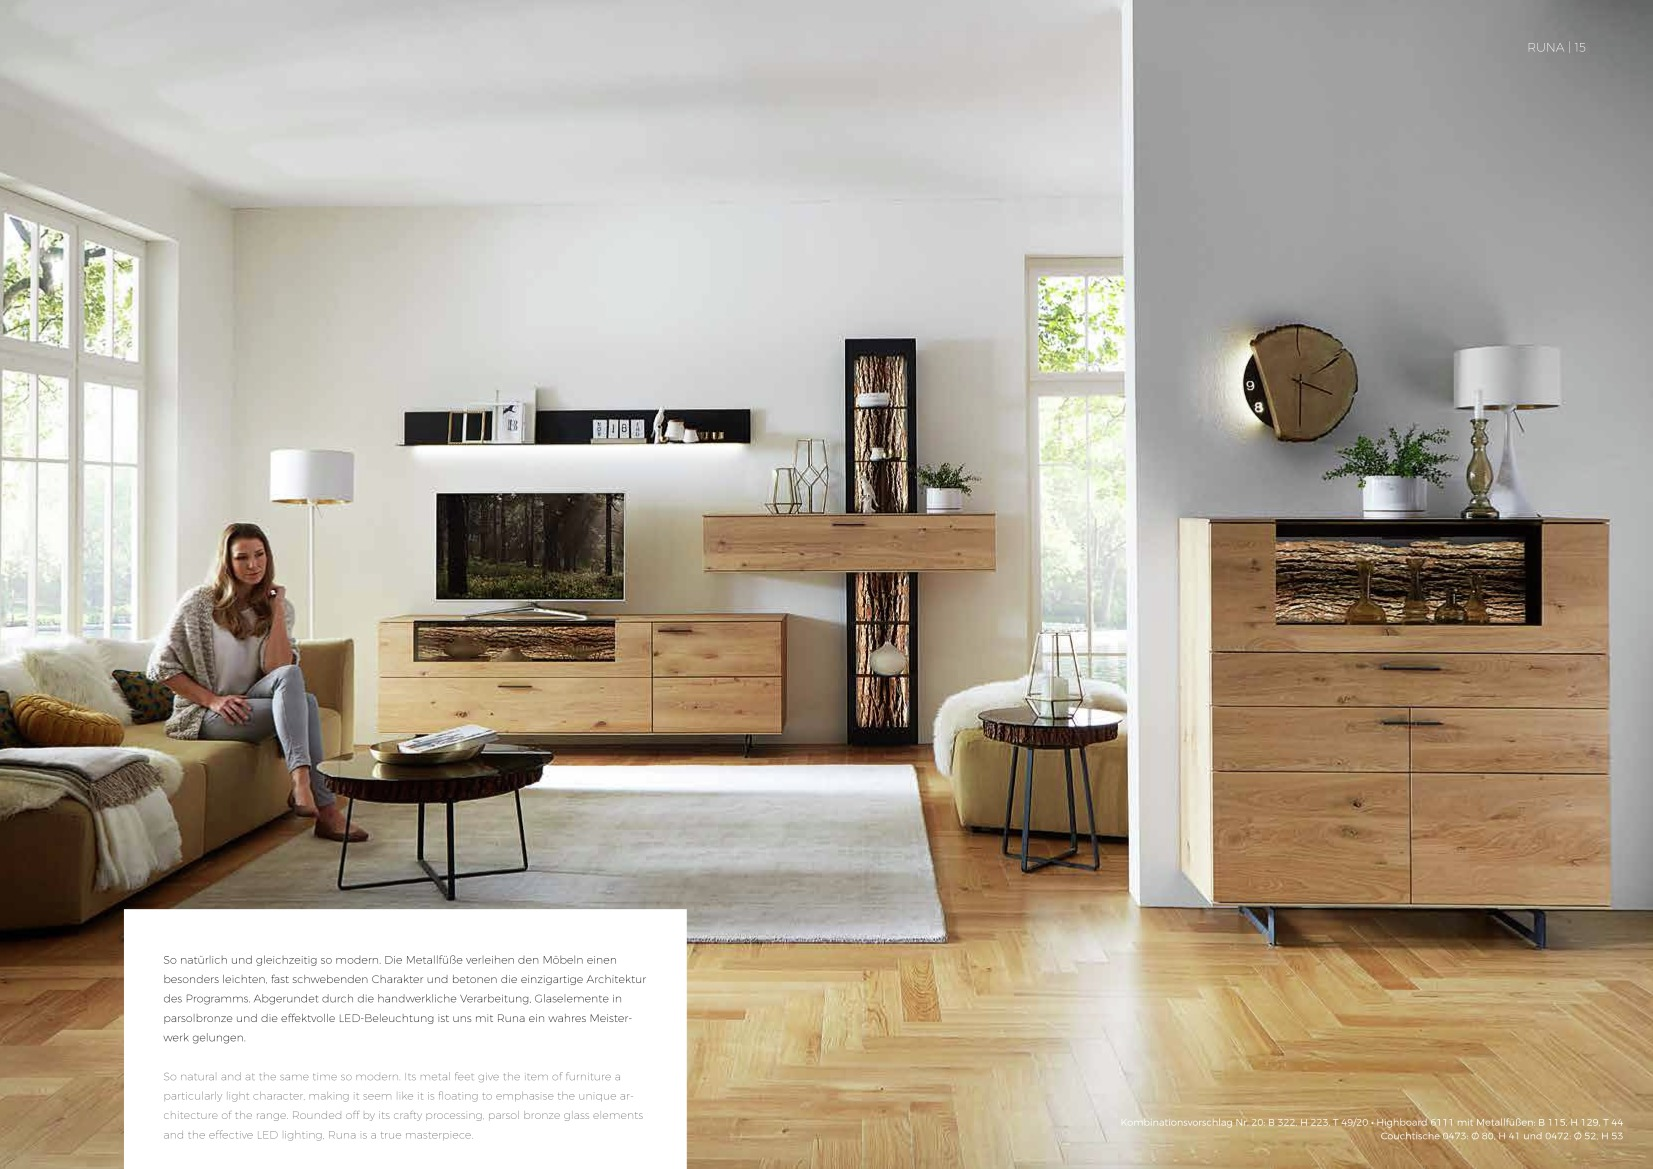 hartmann farbprospekt runa 7 m bel weber neustadt landau karlsruhe. Black Bedroom Furniture Sets. Home Design Ideas